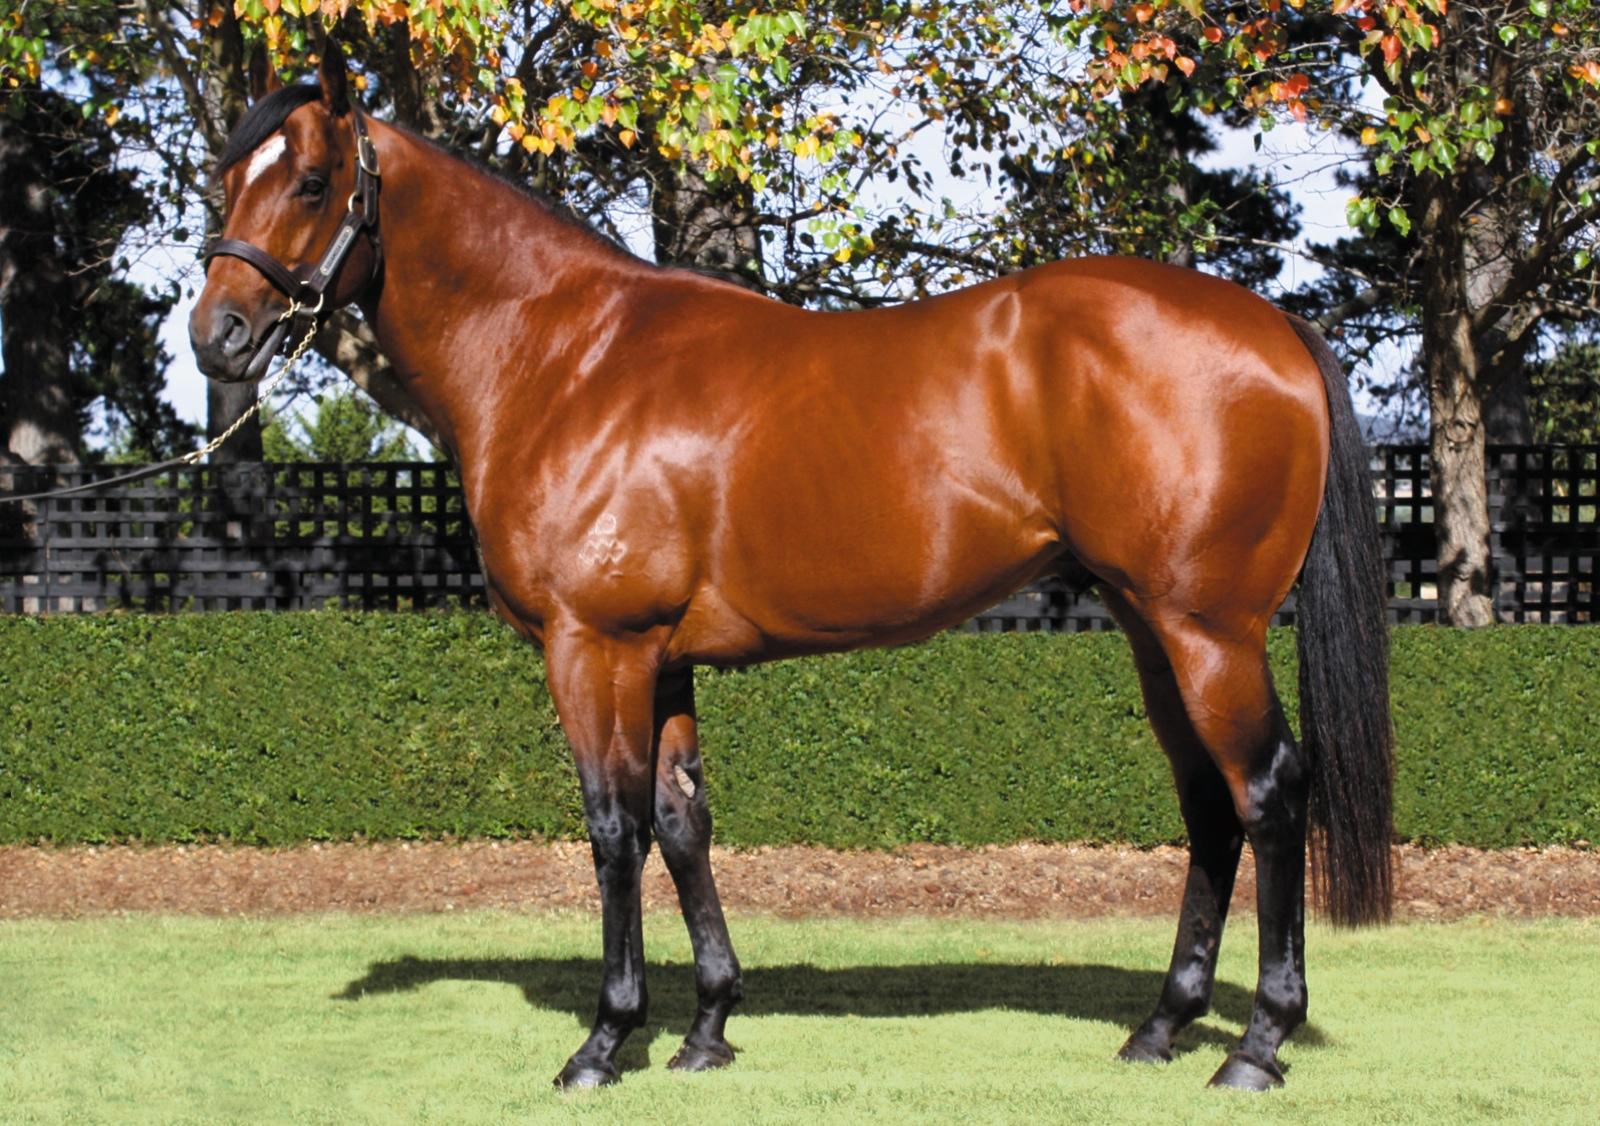 https://www.stallions.com.au/wp-content/uploads/2019/10/103553557.jpg